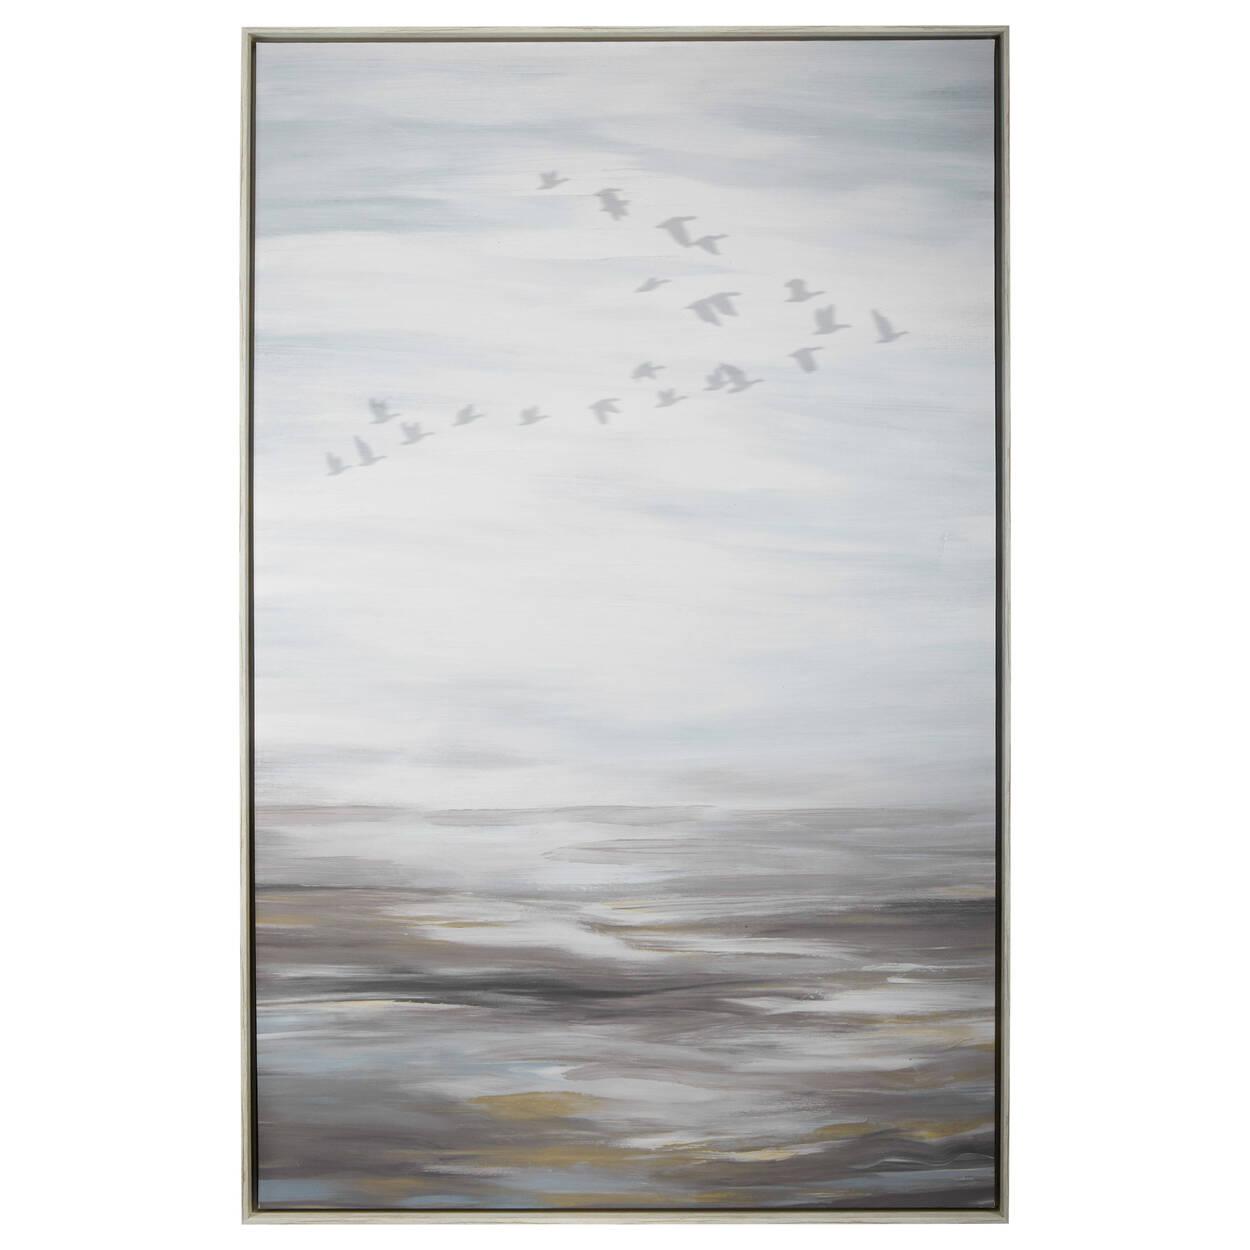 Oversized Printed & Painted Bird Framed Art | Bouclair.com